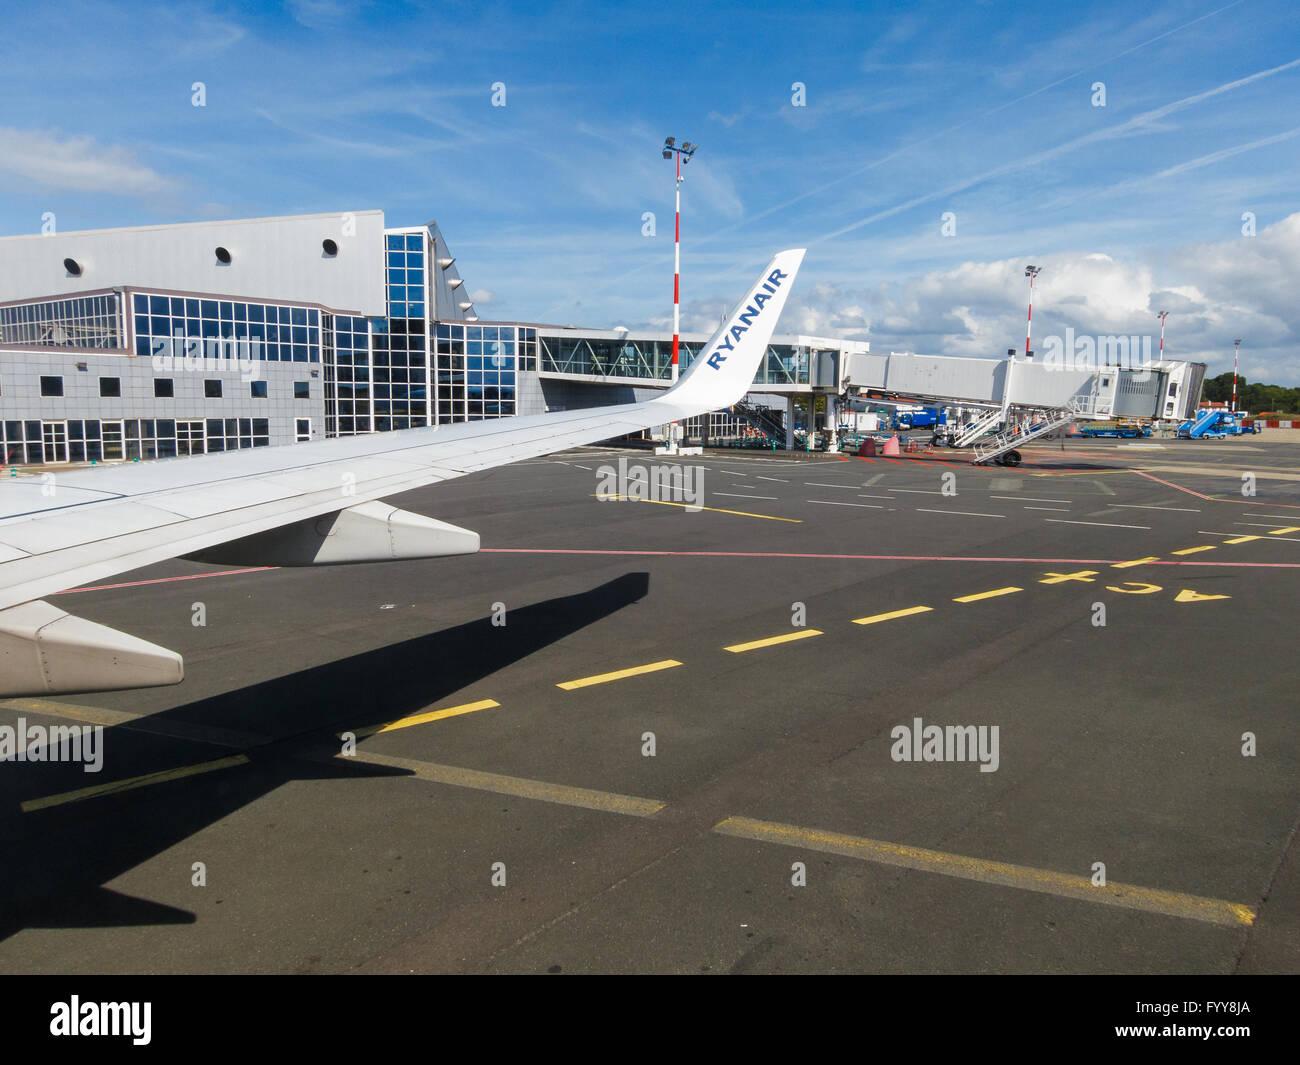 Ryanair airplane at Biarritz Anglet Bayonne Airport, France - Stock Image